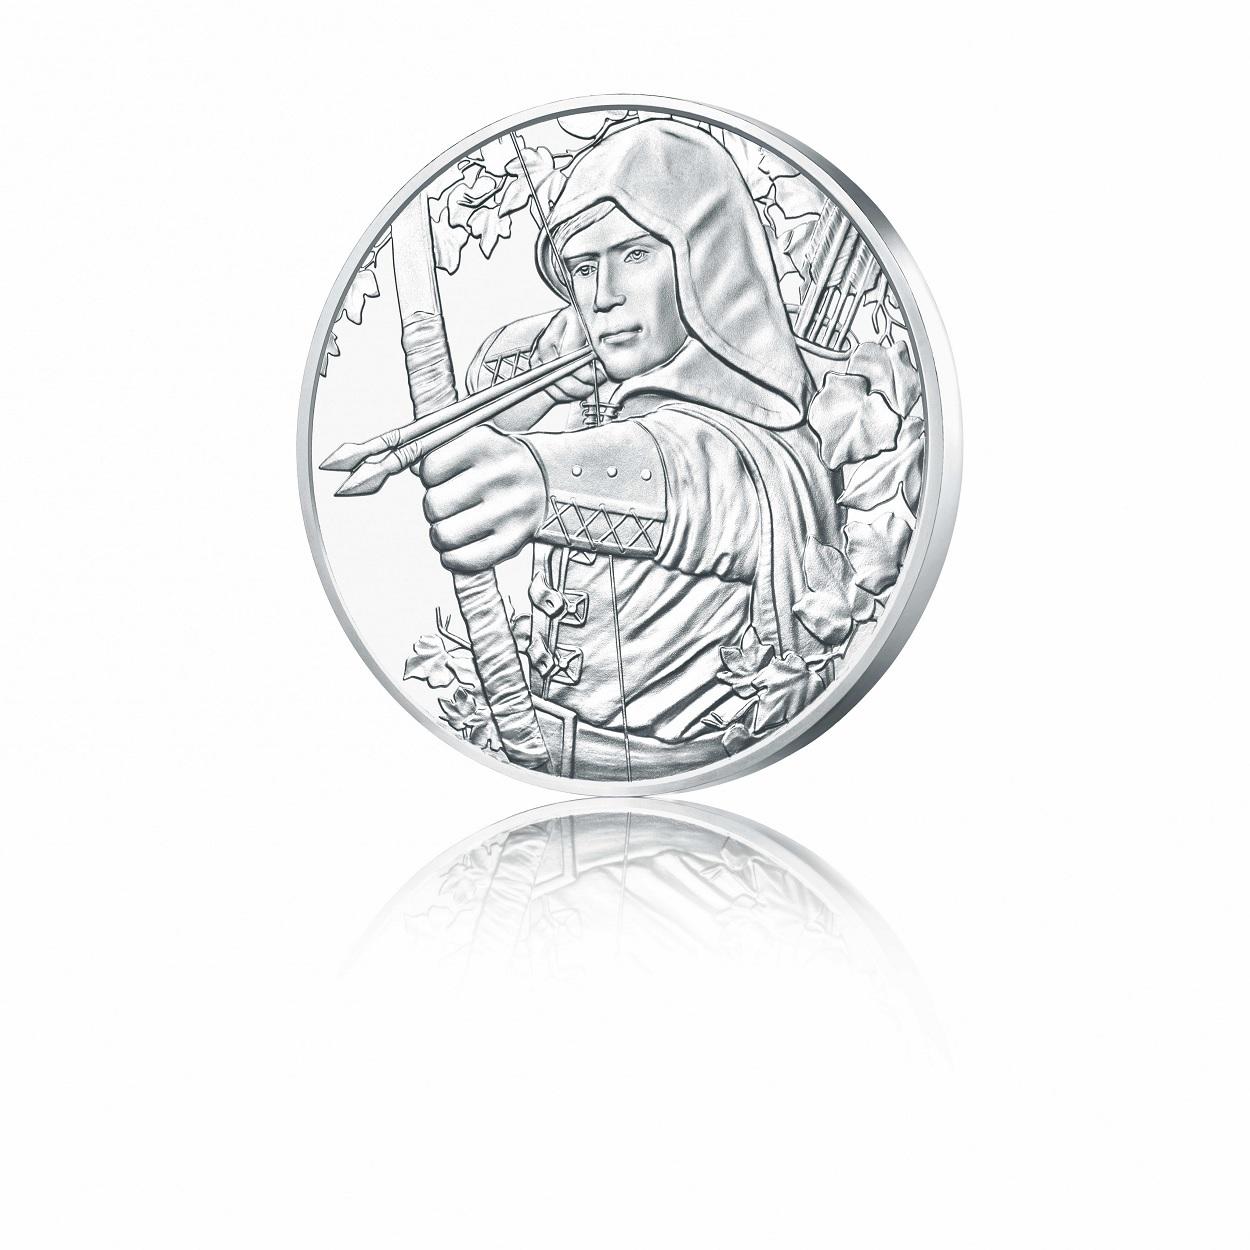 1,50 euro Austria 2019 1 ounce silver - Robin Hood Reverse (zoom)